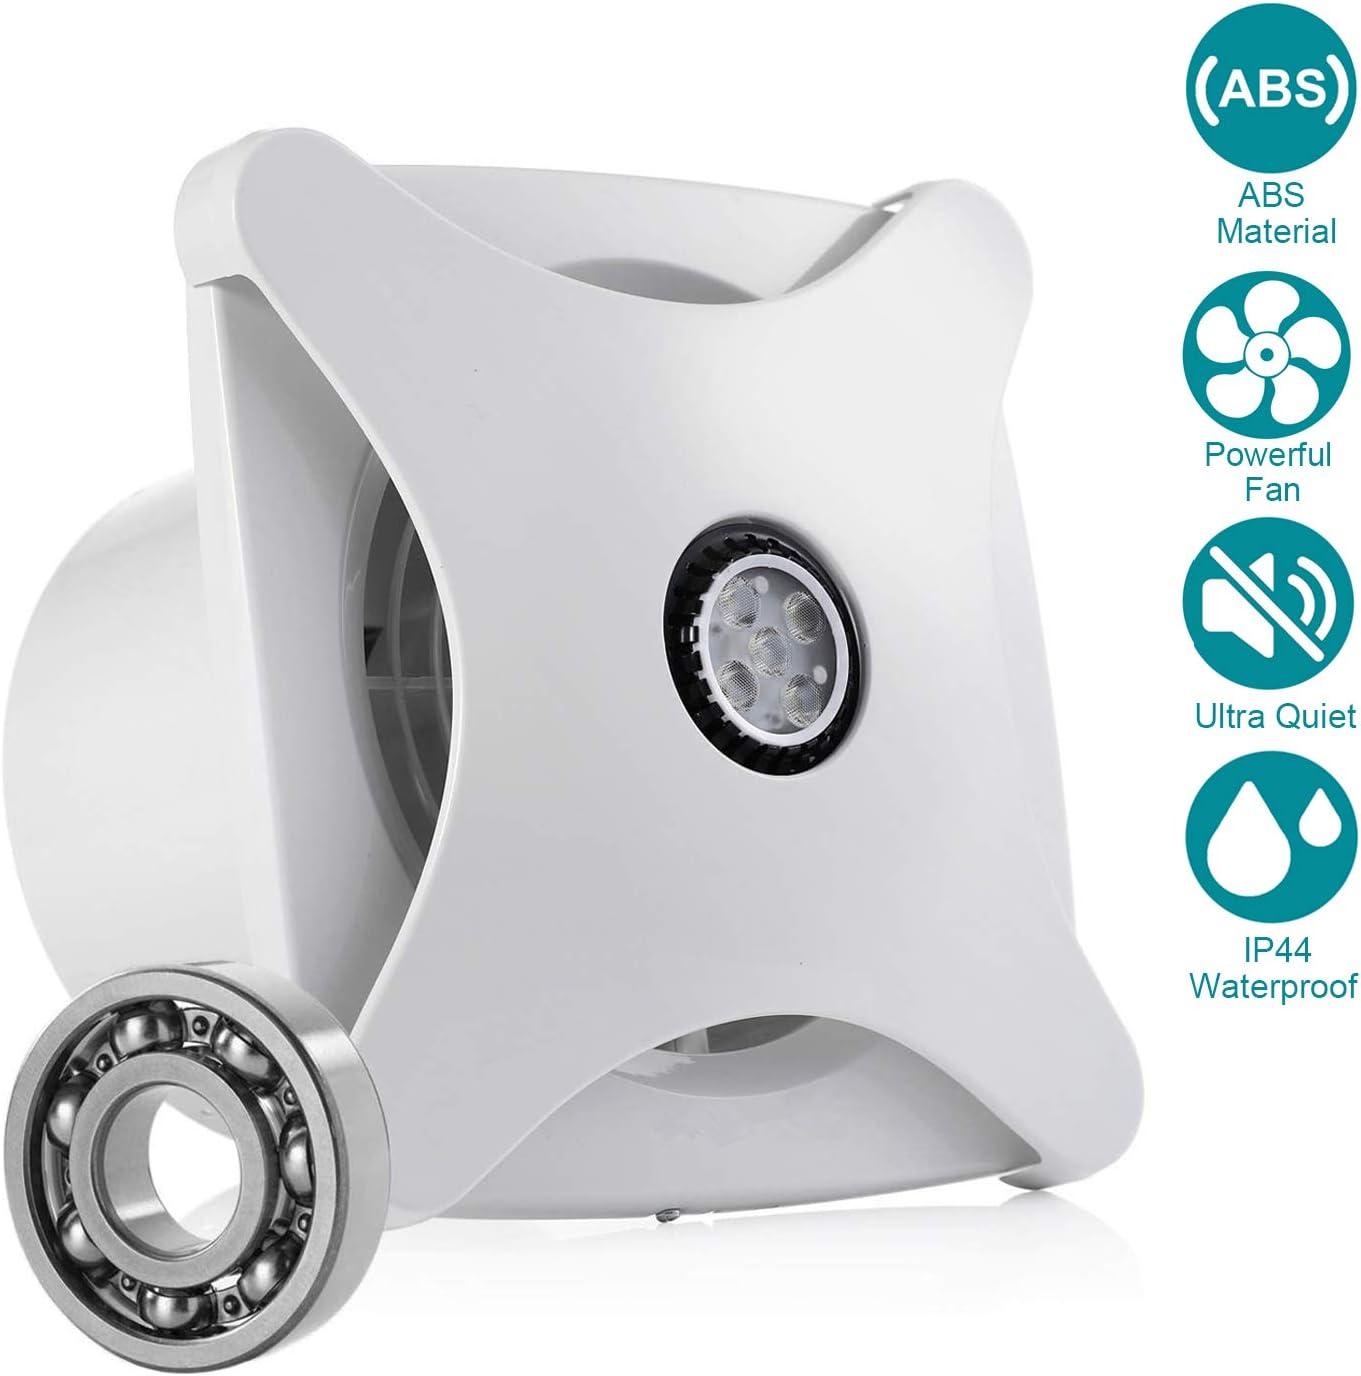 HG Power 150mm Ventilador Extractor de aire Silencioso 197m³/h para Oficina, Baño, Dormitorio